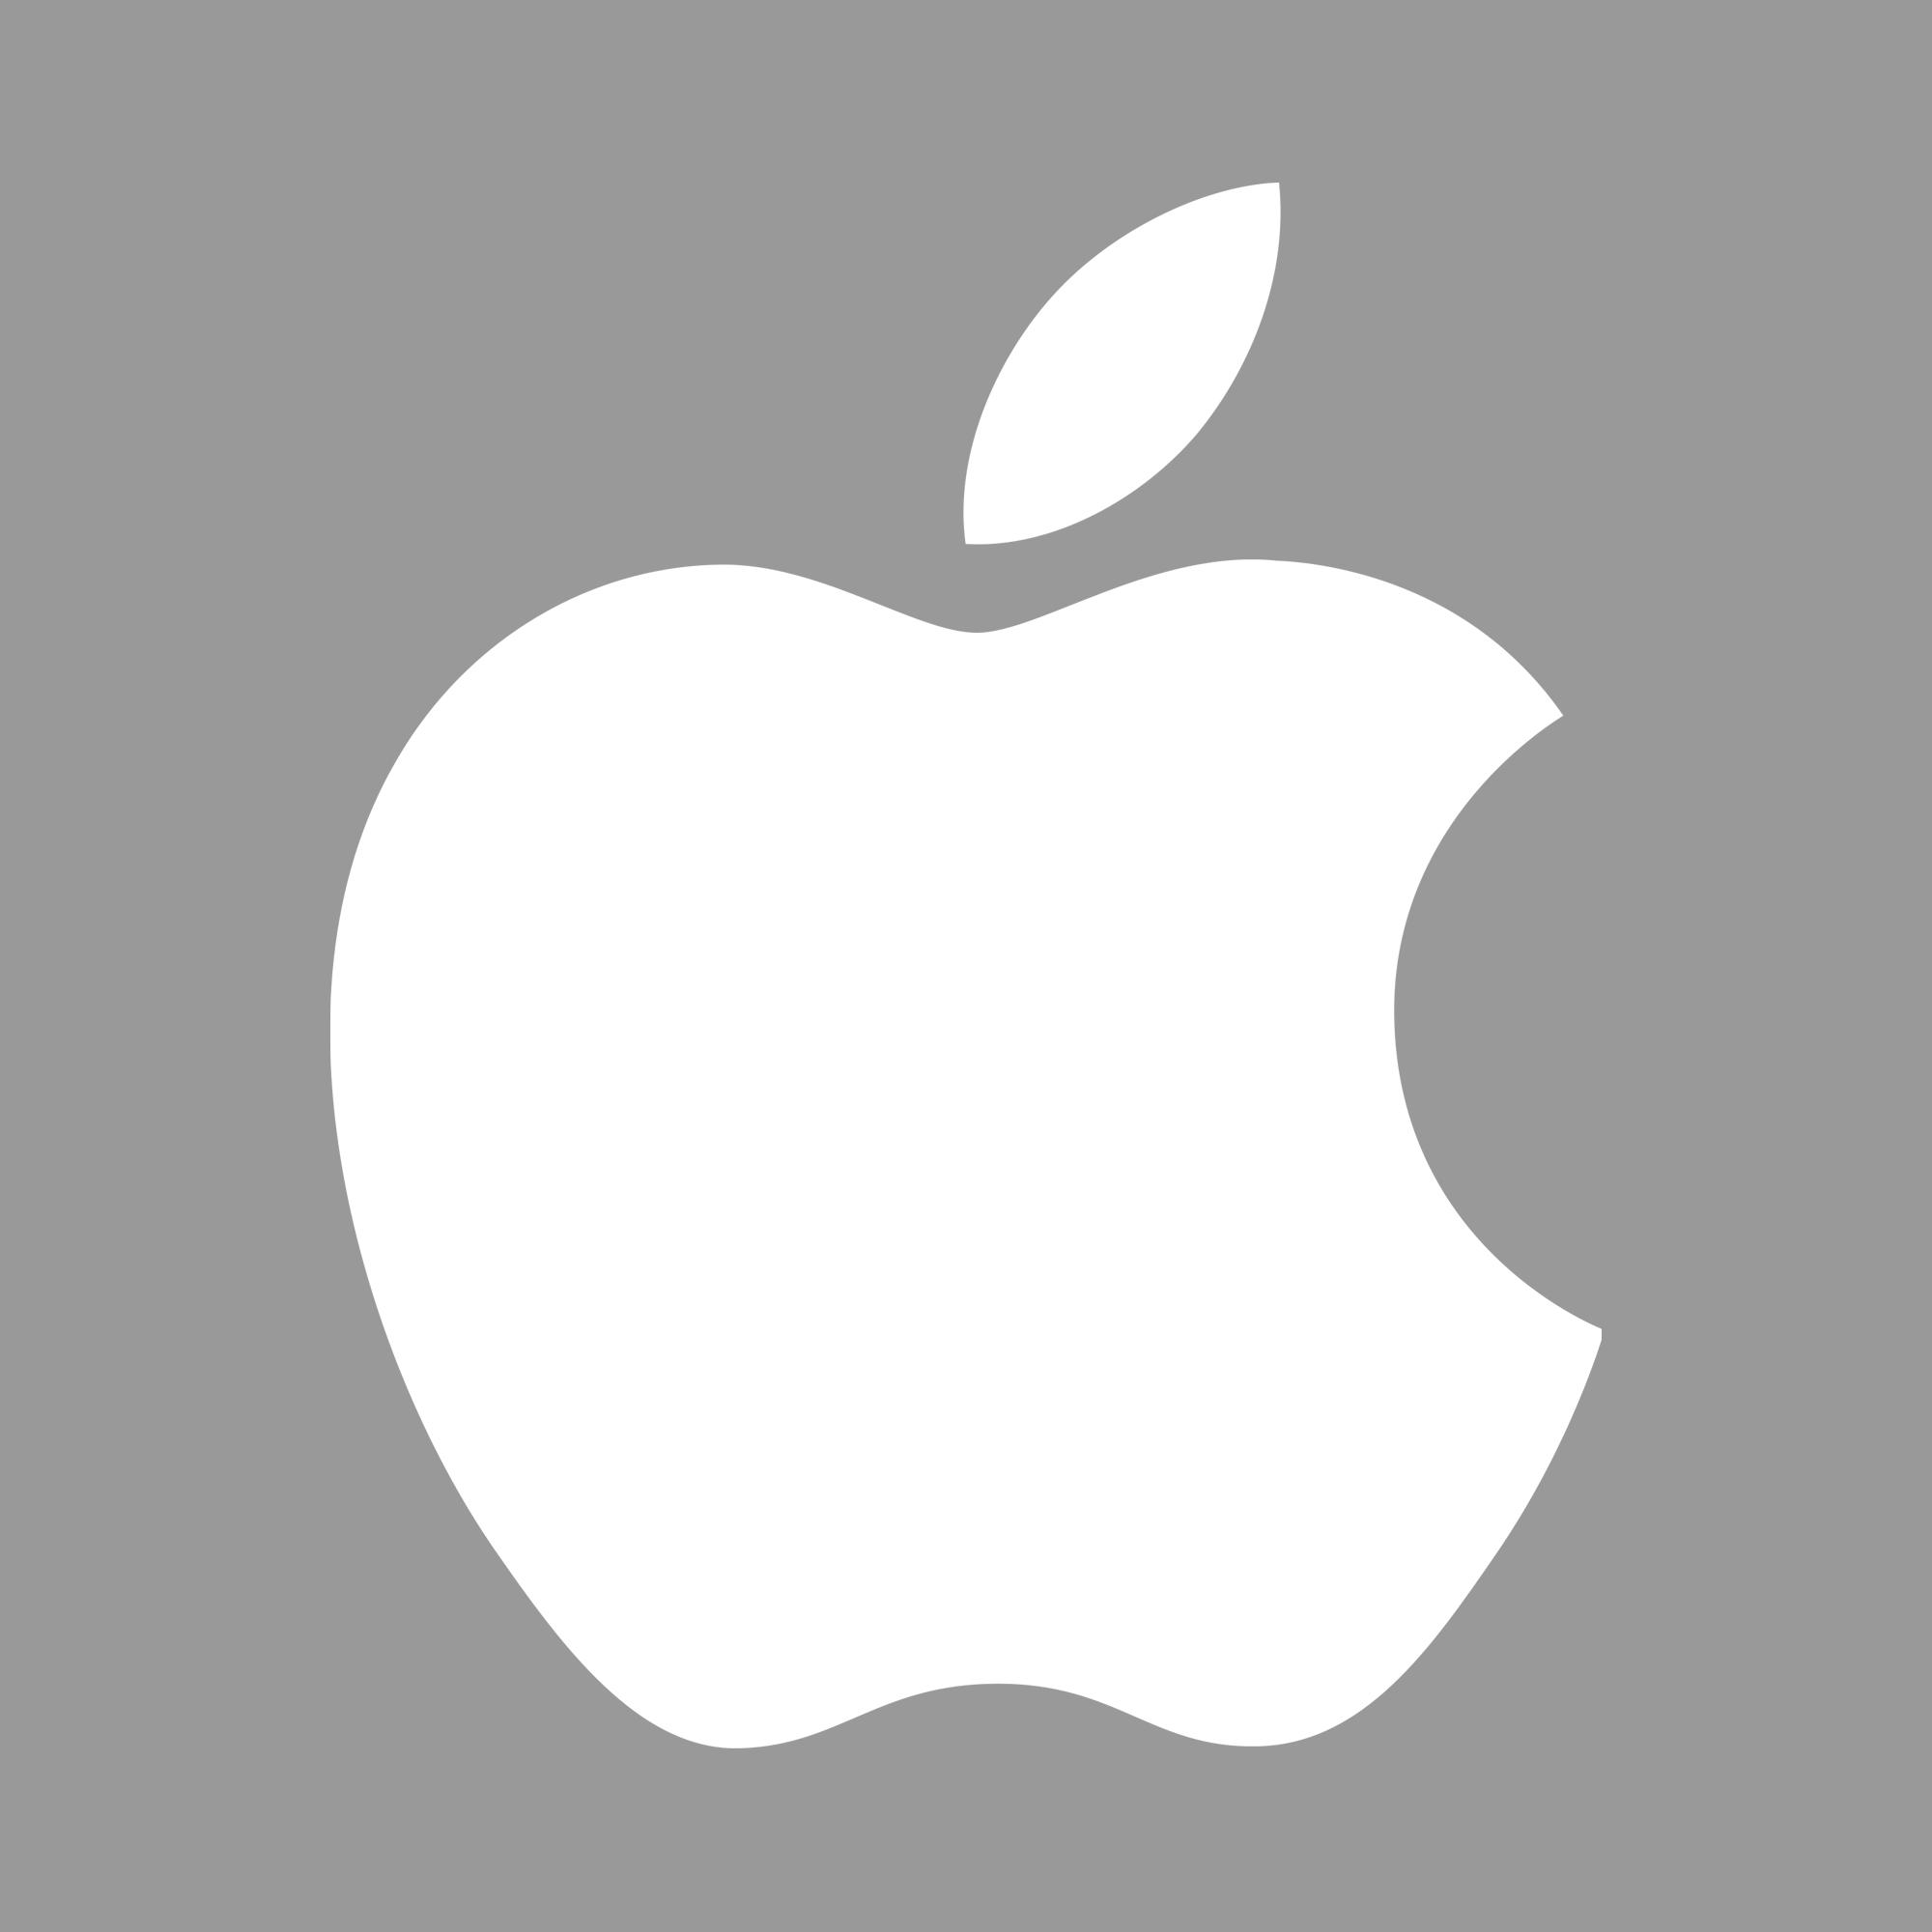 Apple_gray_logo.png